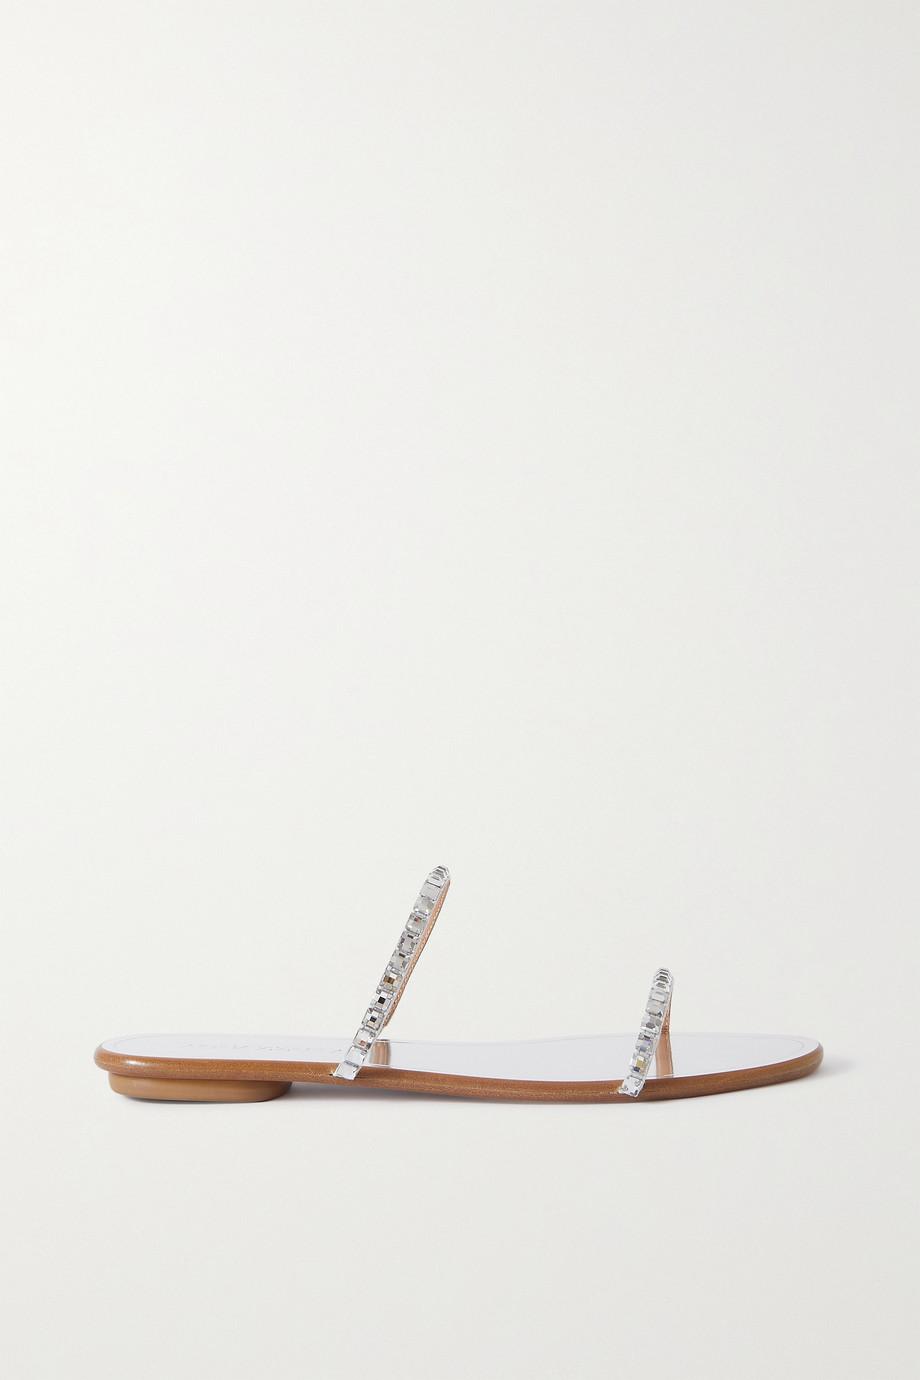 Aquazzura Midnight crystal-embellished metallic leather slides